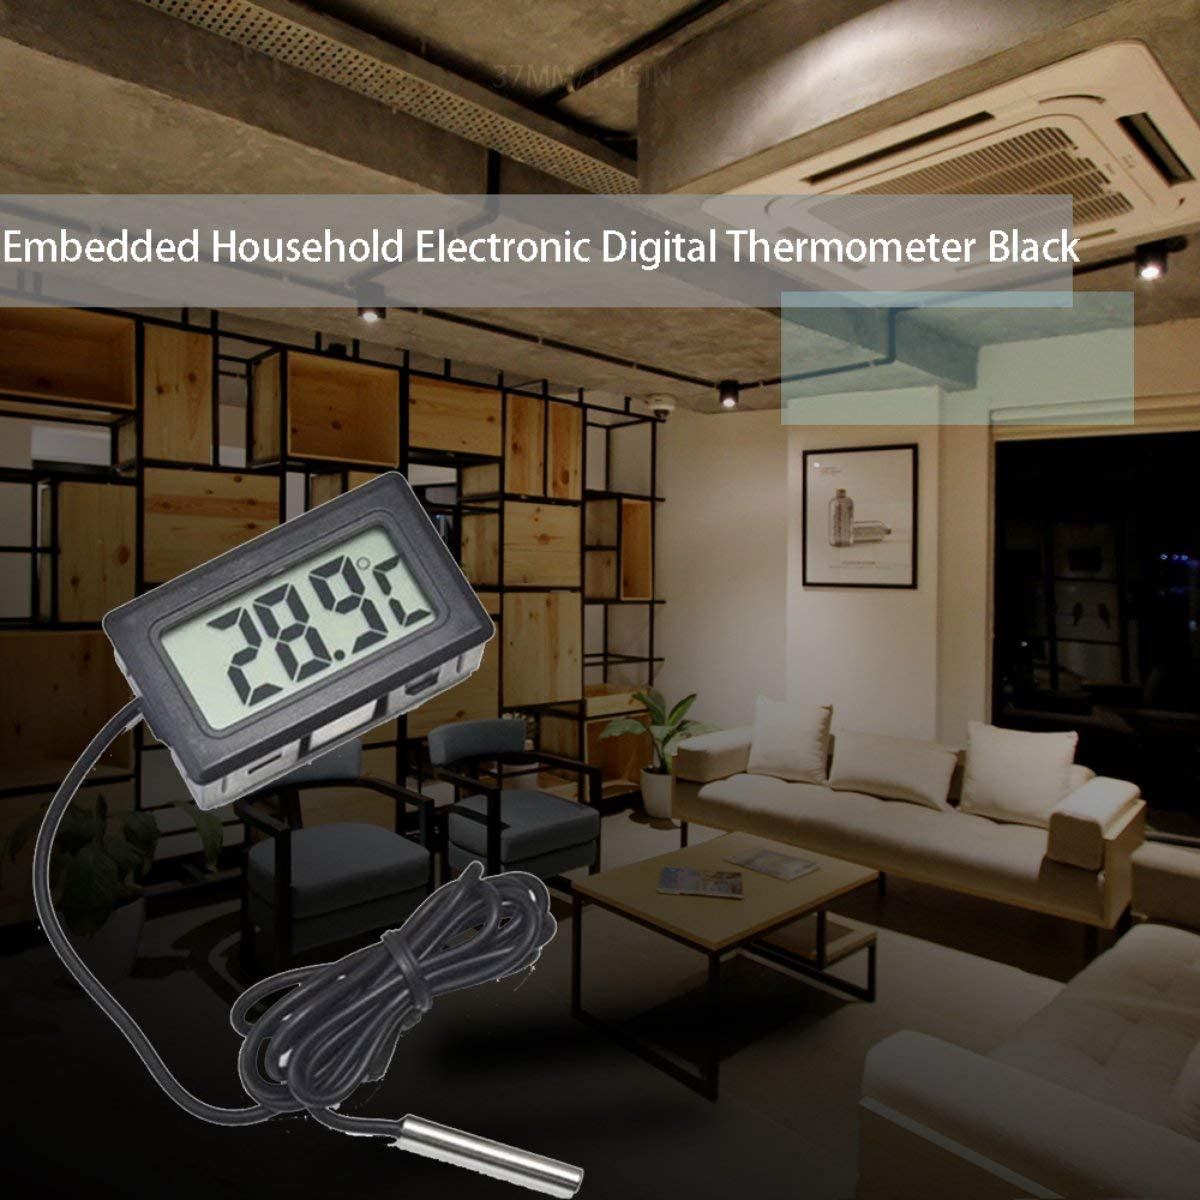 Gugutogo Embedded Electronic Digital Thermometer Fy-10 Digital Electronic Refrigerator Thermometer